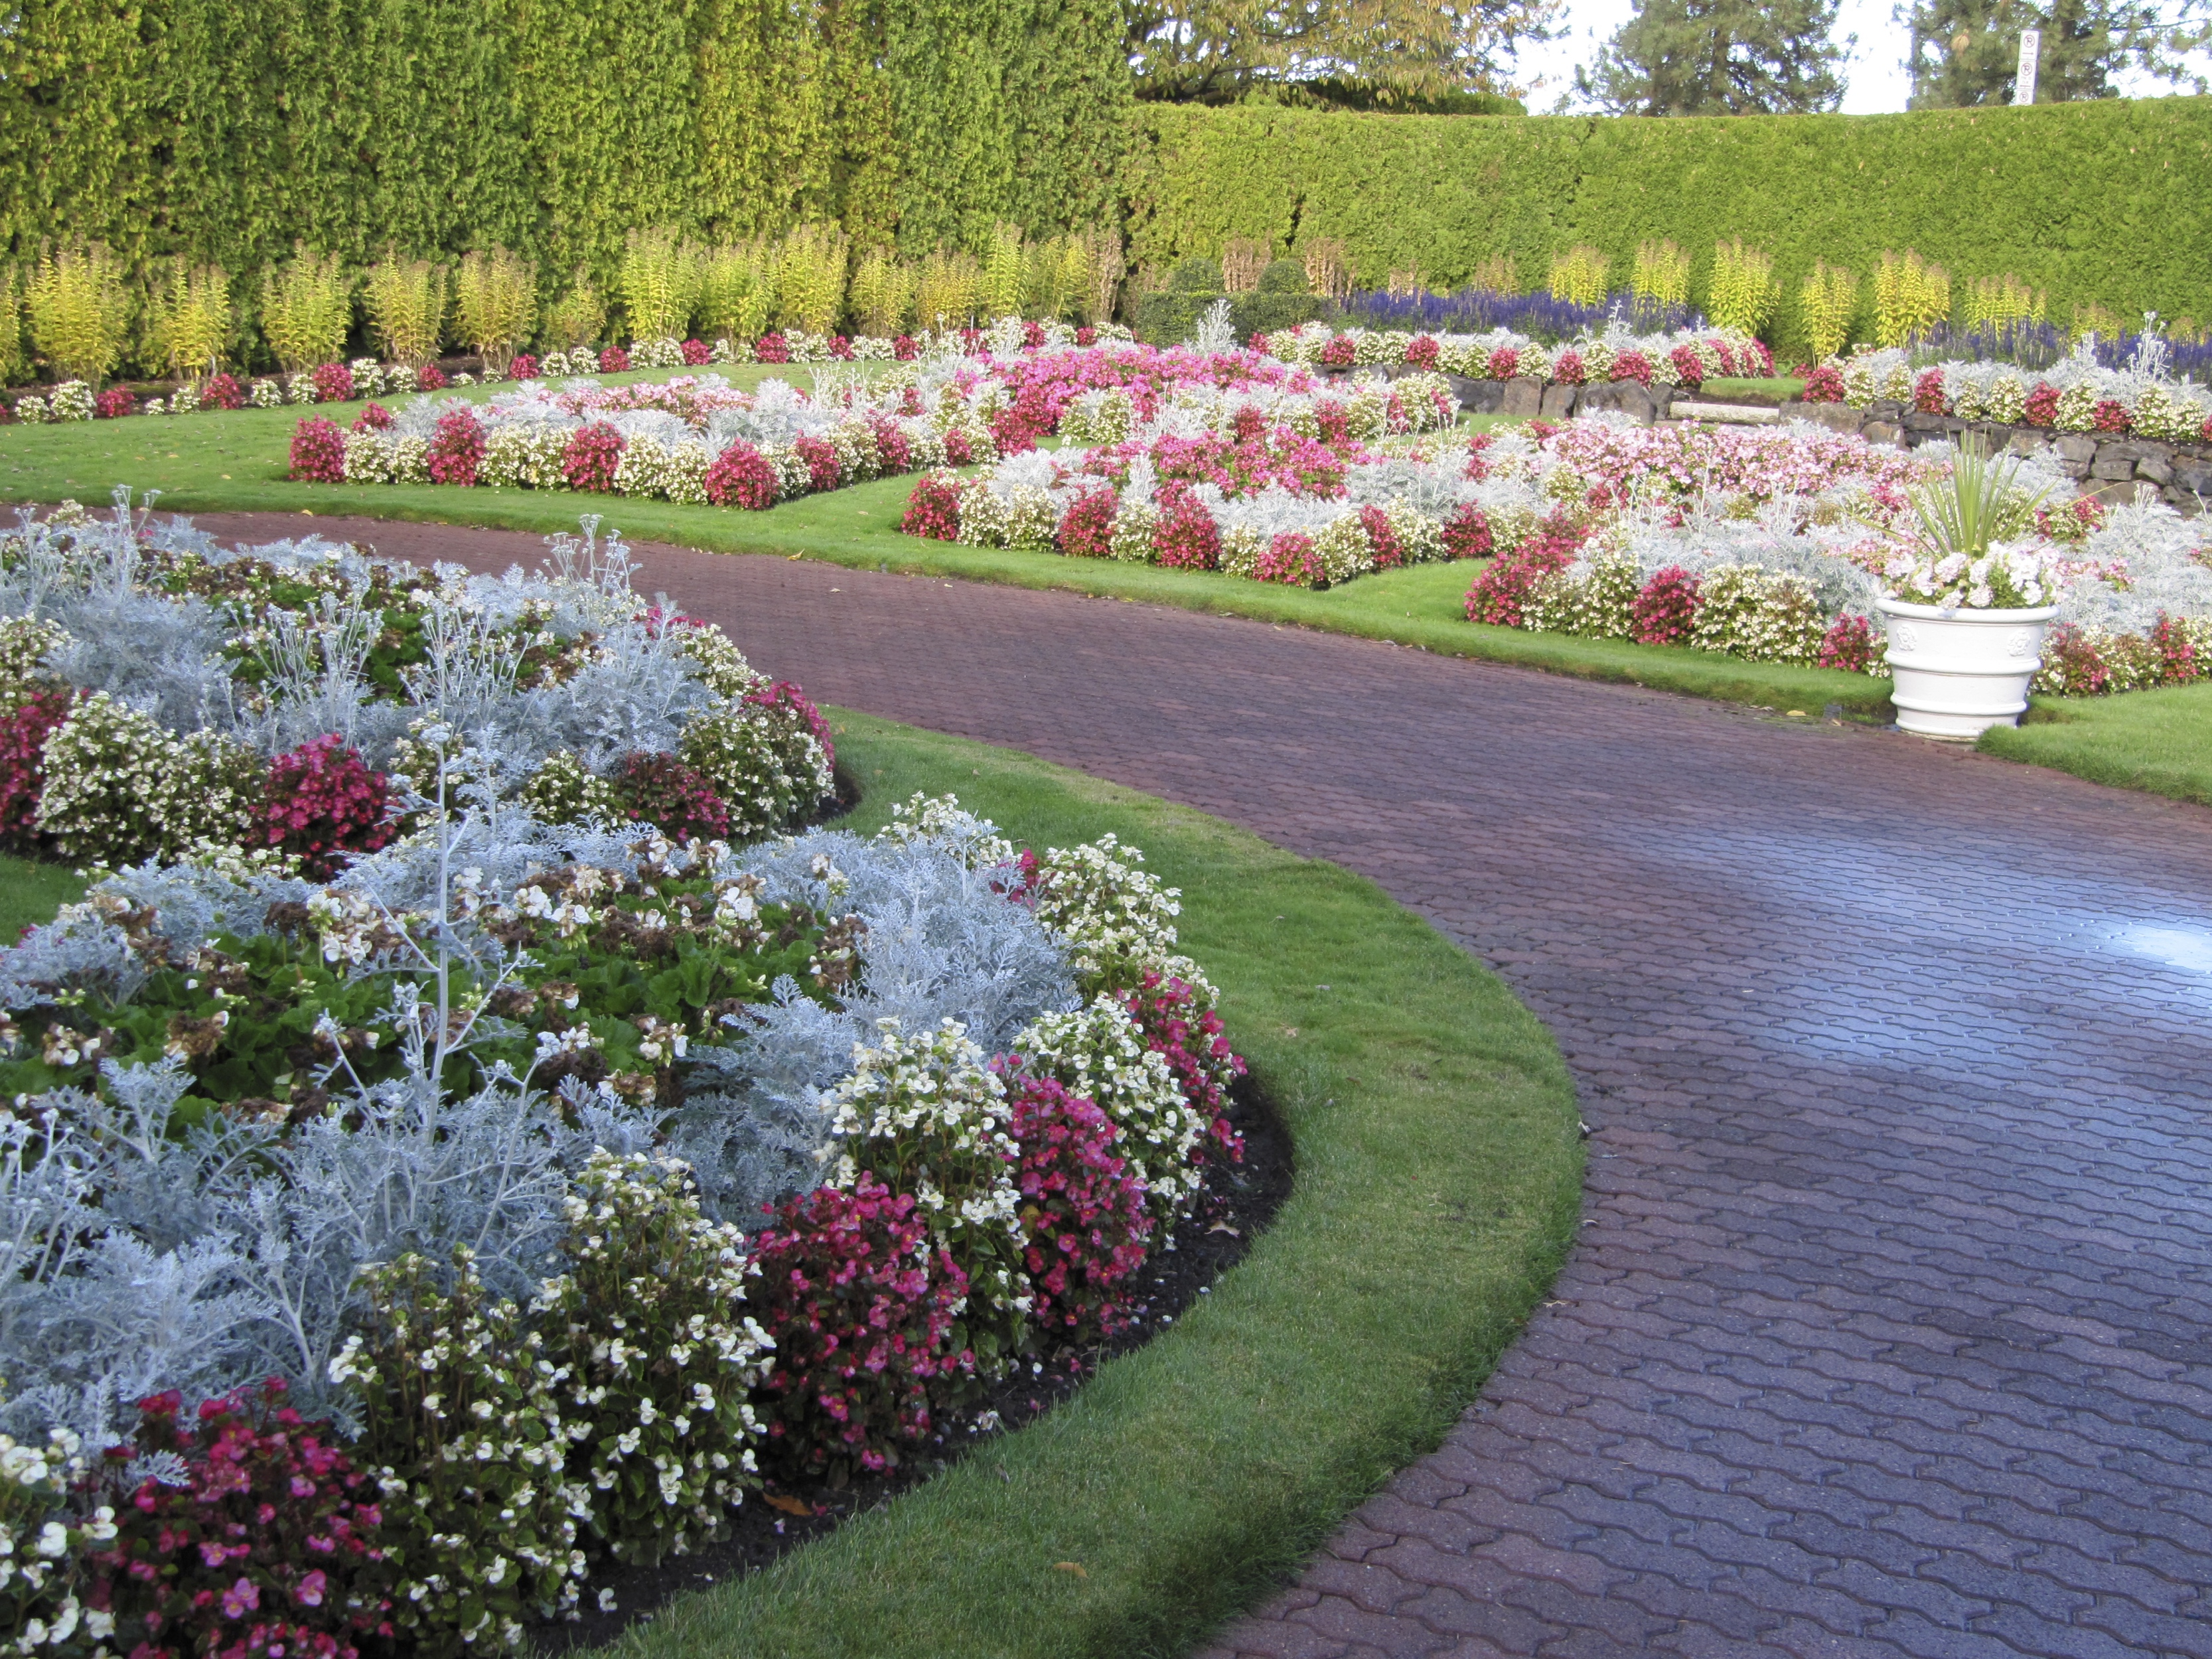 Matthews-Woldson Gardens